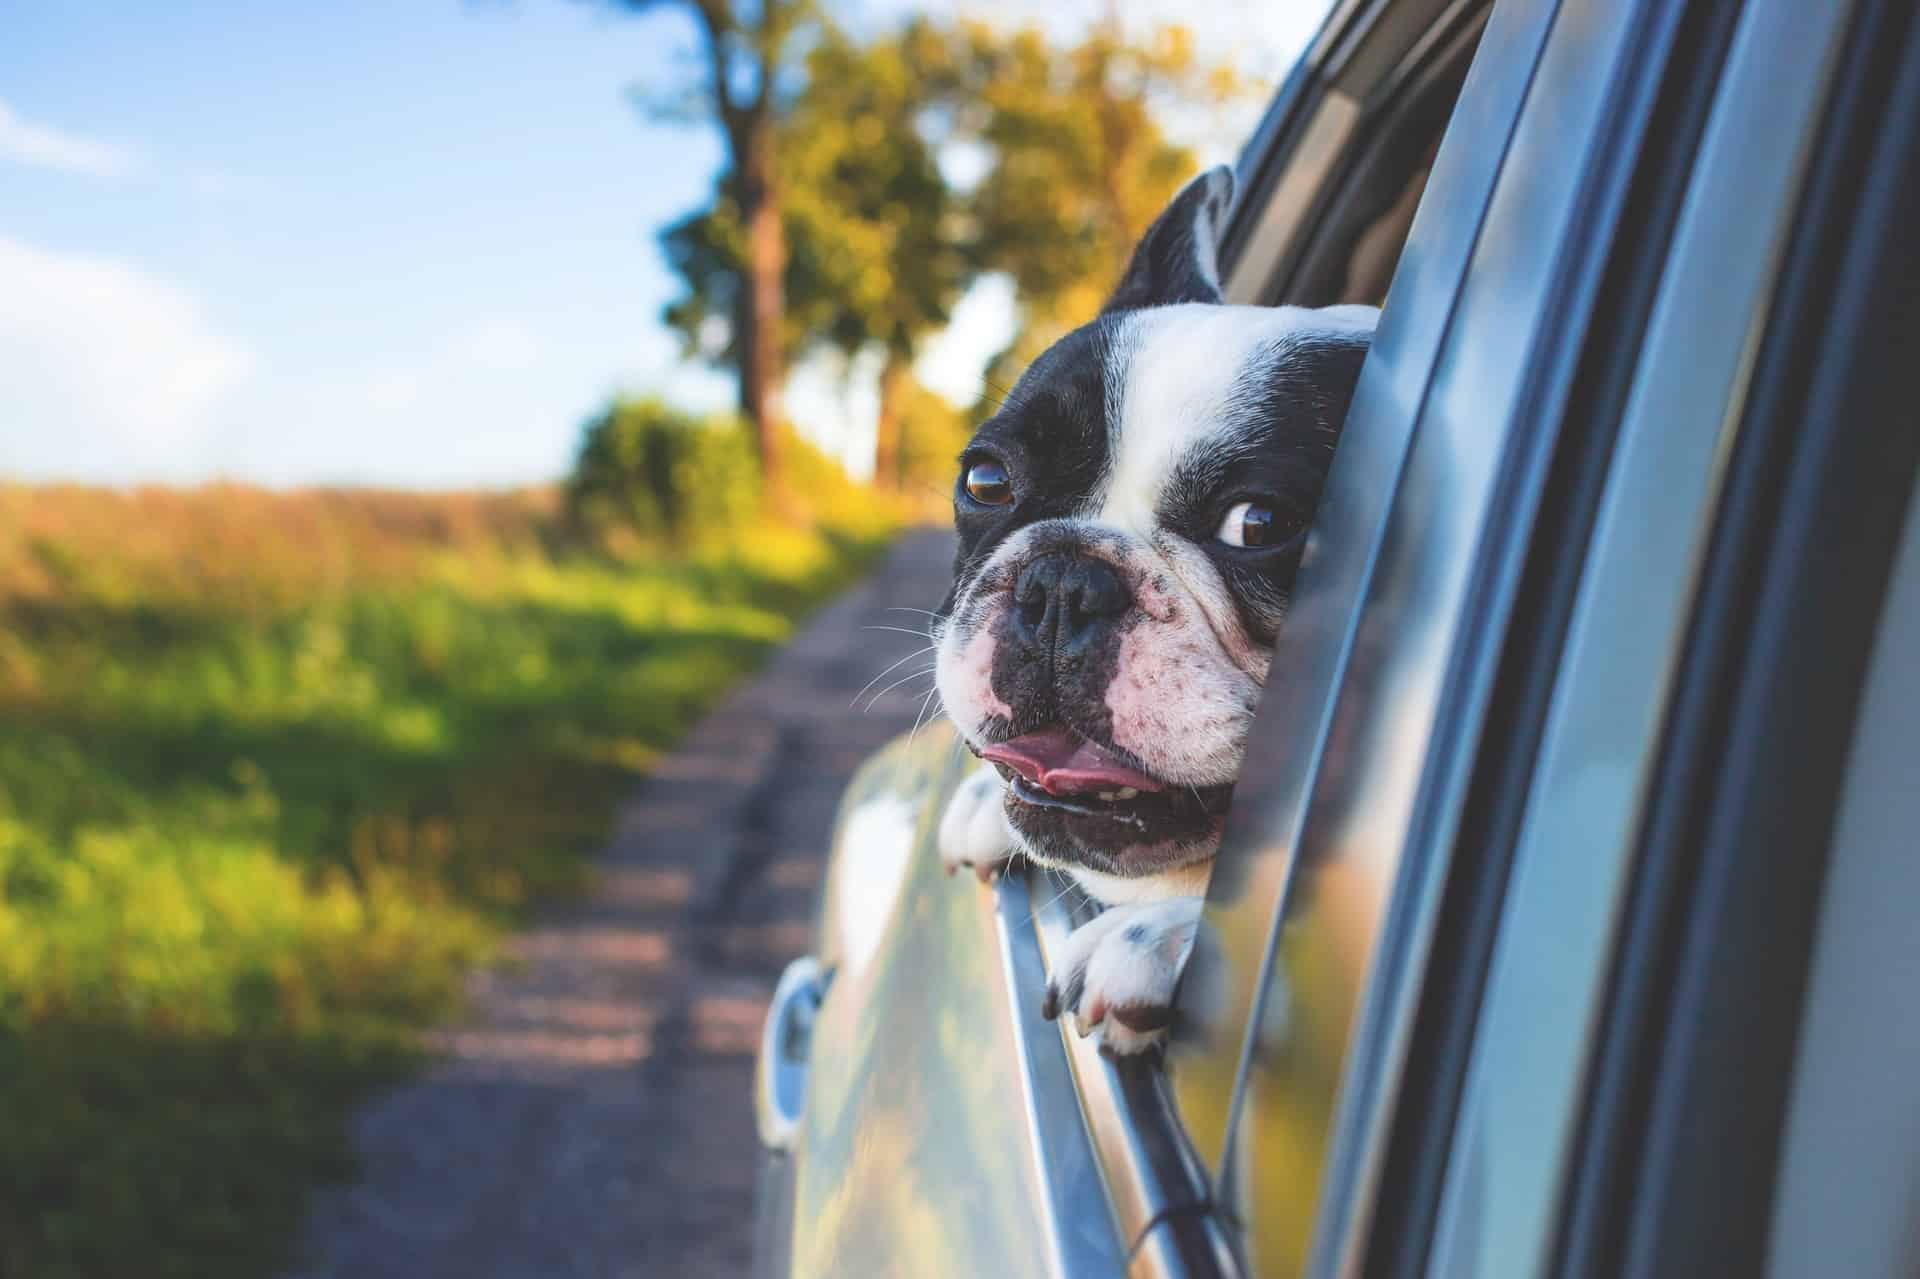 my dog hates car rides